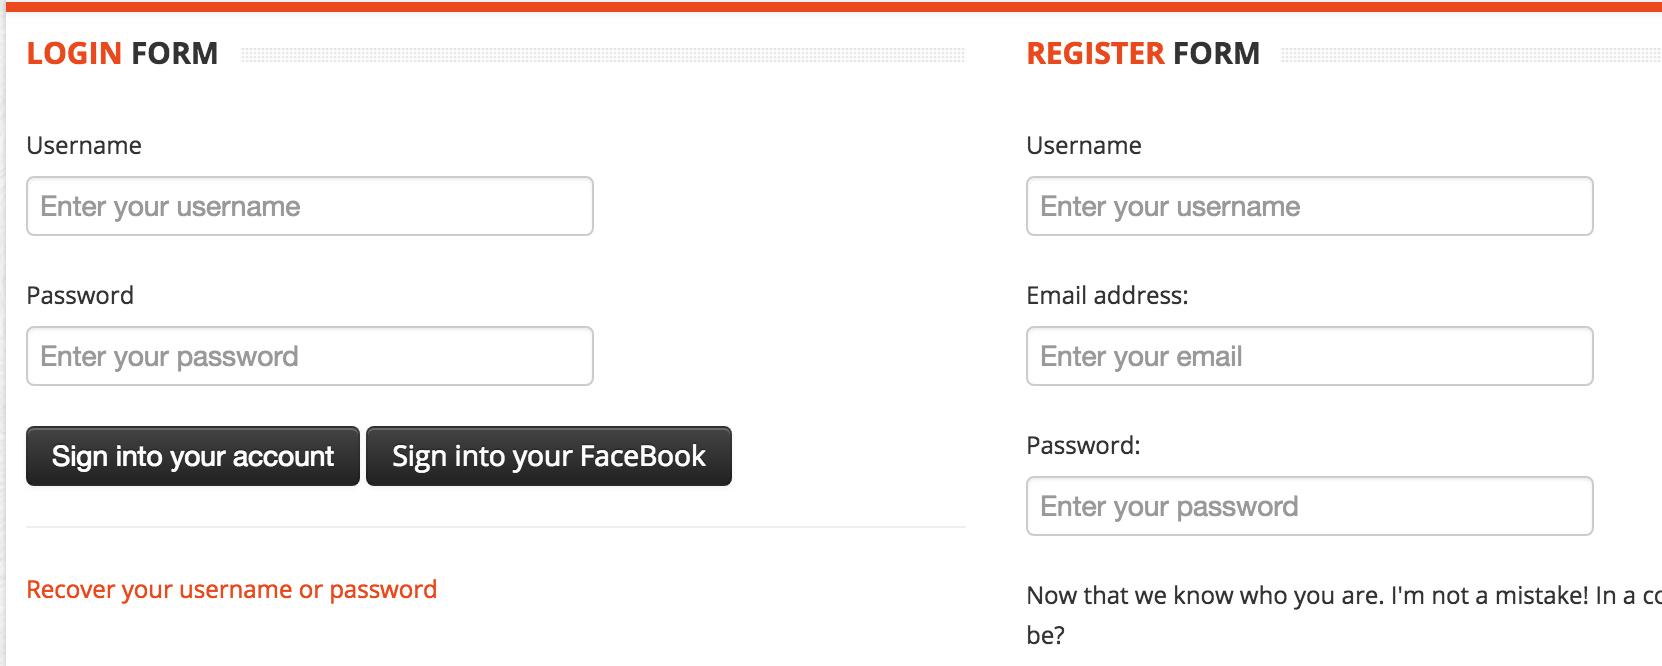 đăng nhập facebook trong cakephp